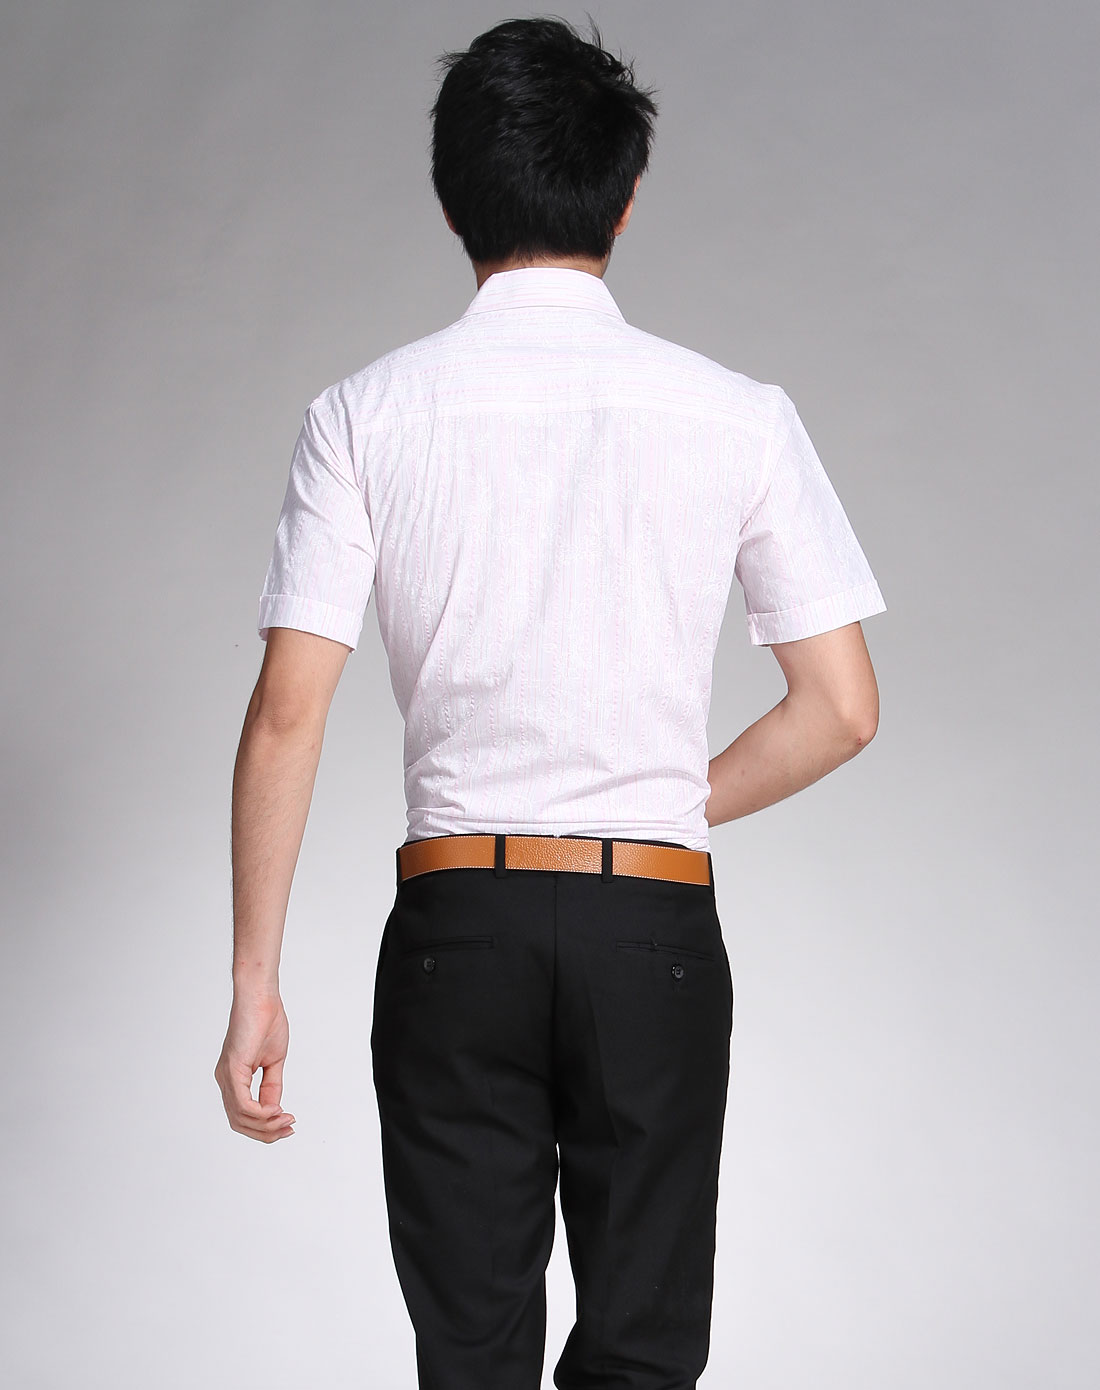 t恤 t恤 衬衫 衬衣 衣服 1100_1390 竖版 竖屏